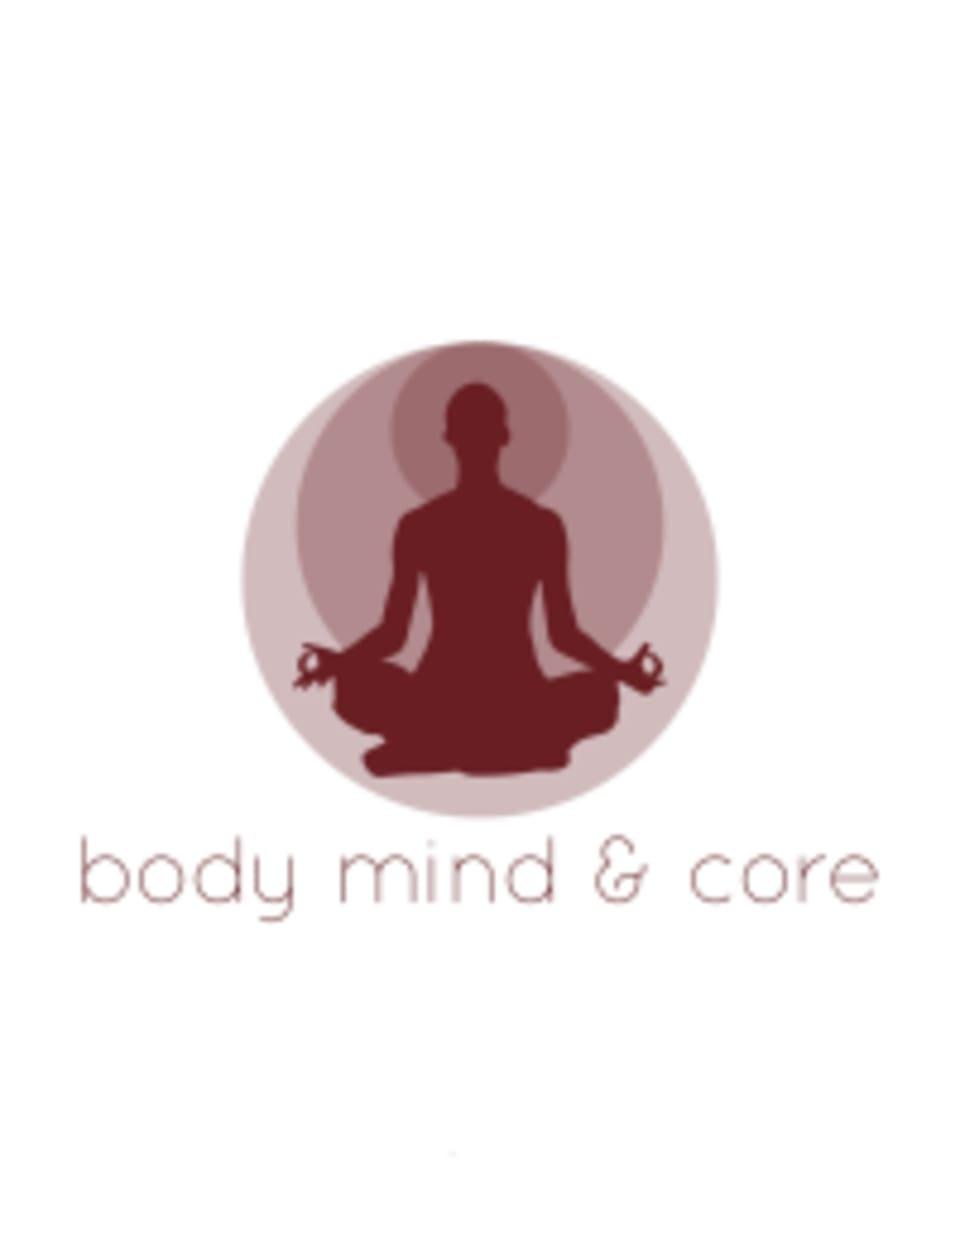 Body Mind & Core logo